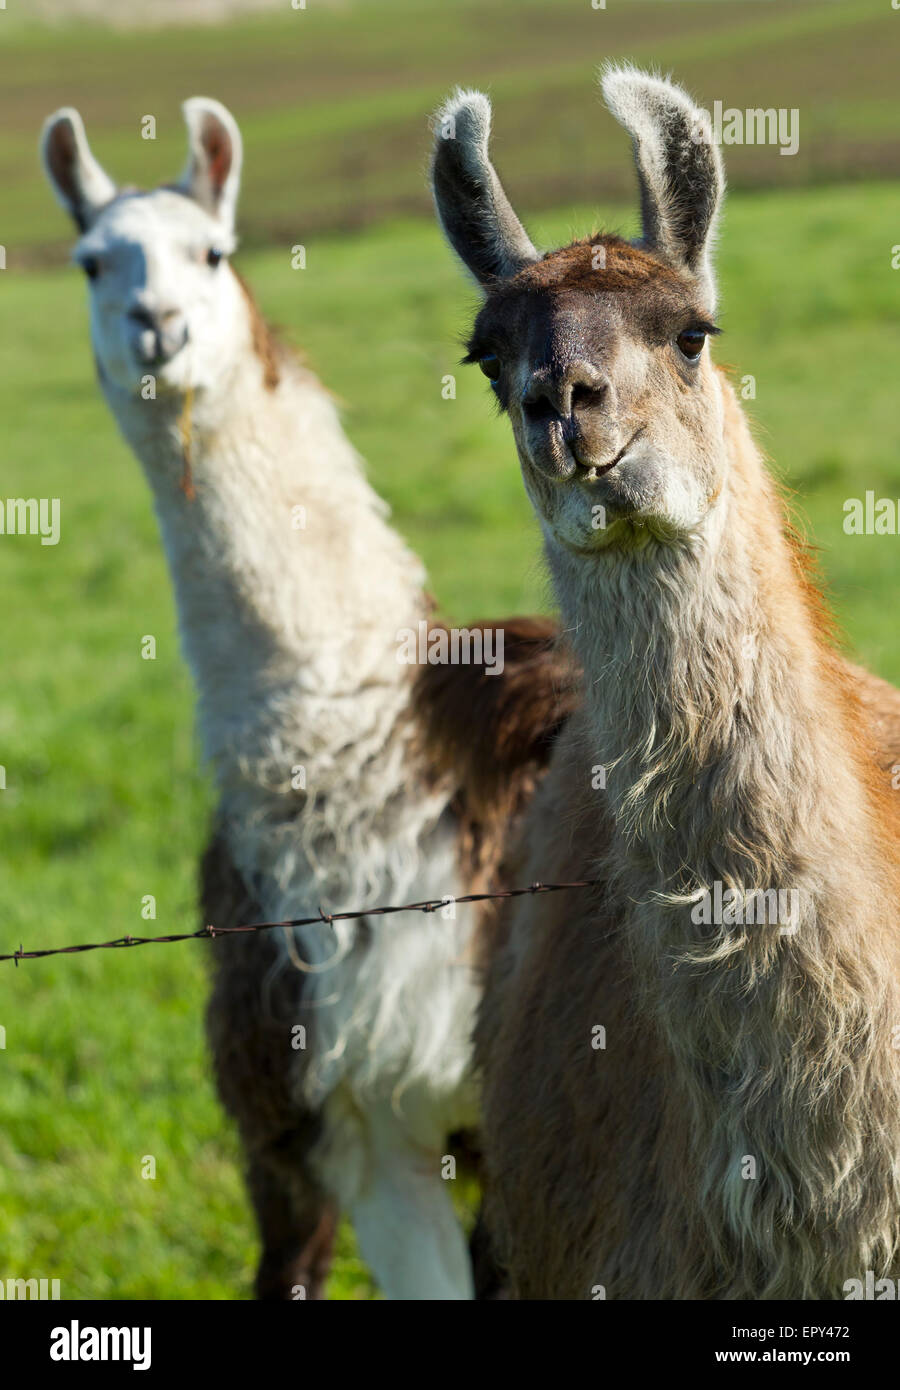 Llama photo bomb. - Stock Image